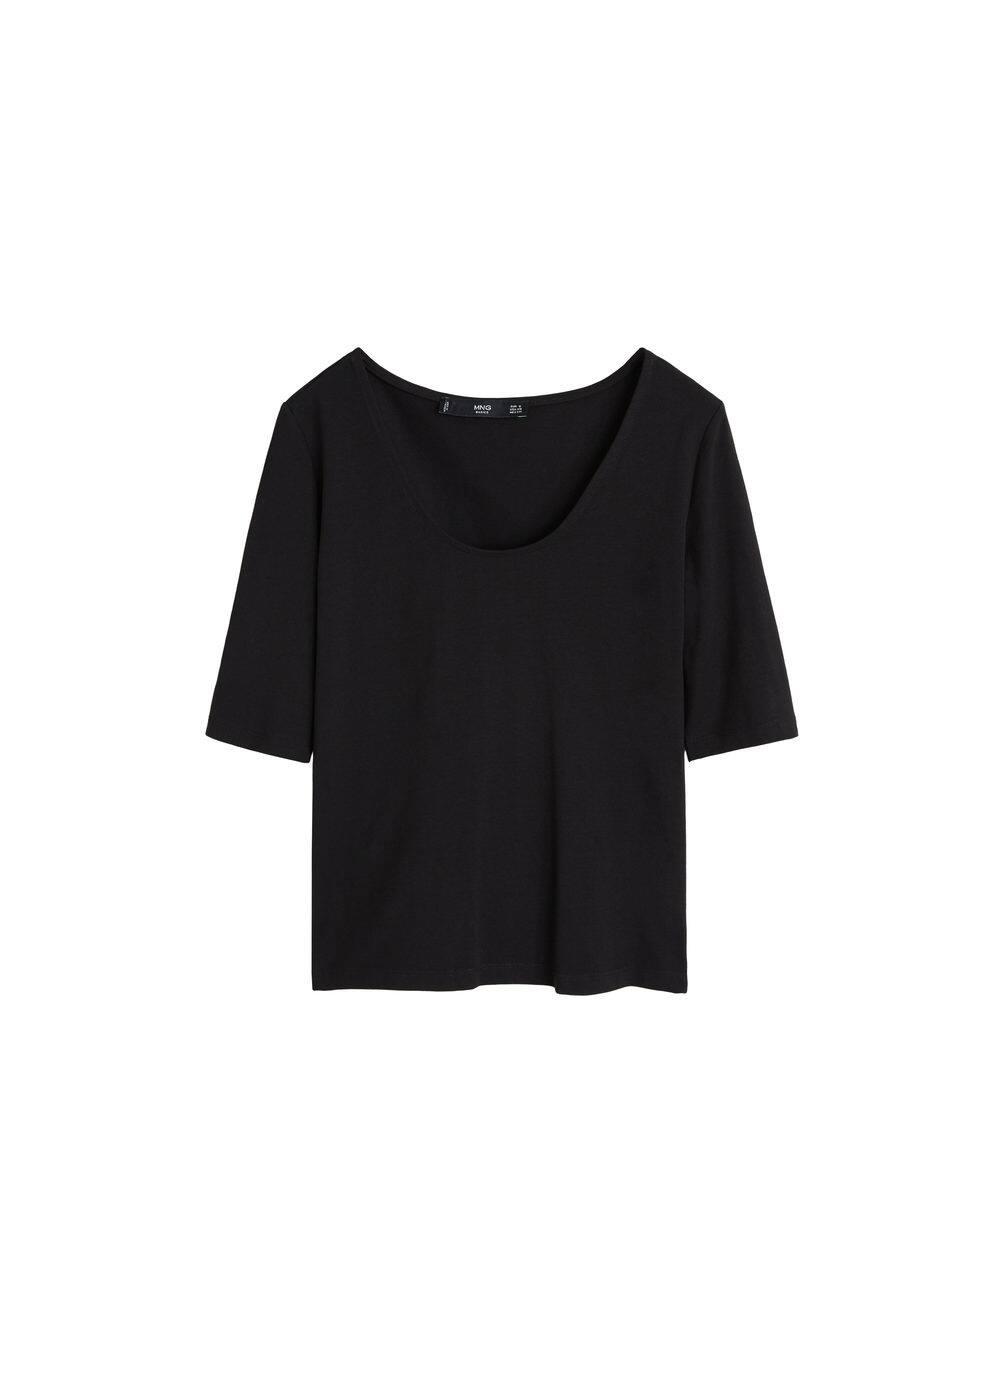 m-camly:camiseta basica algodon